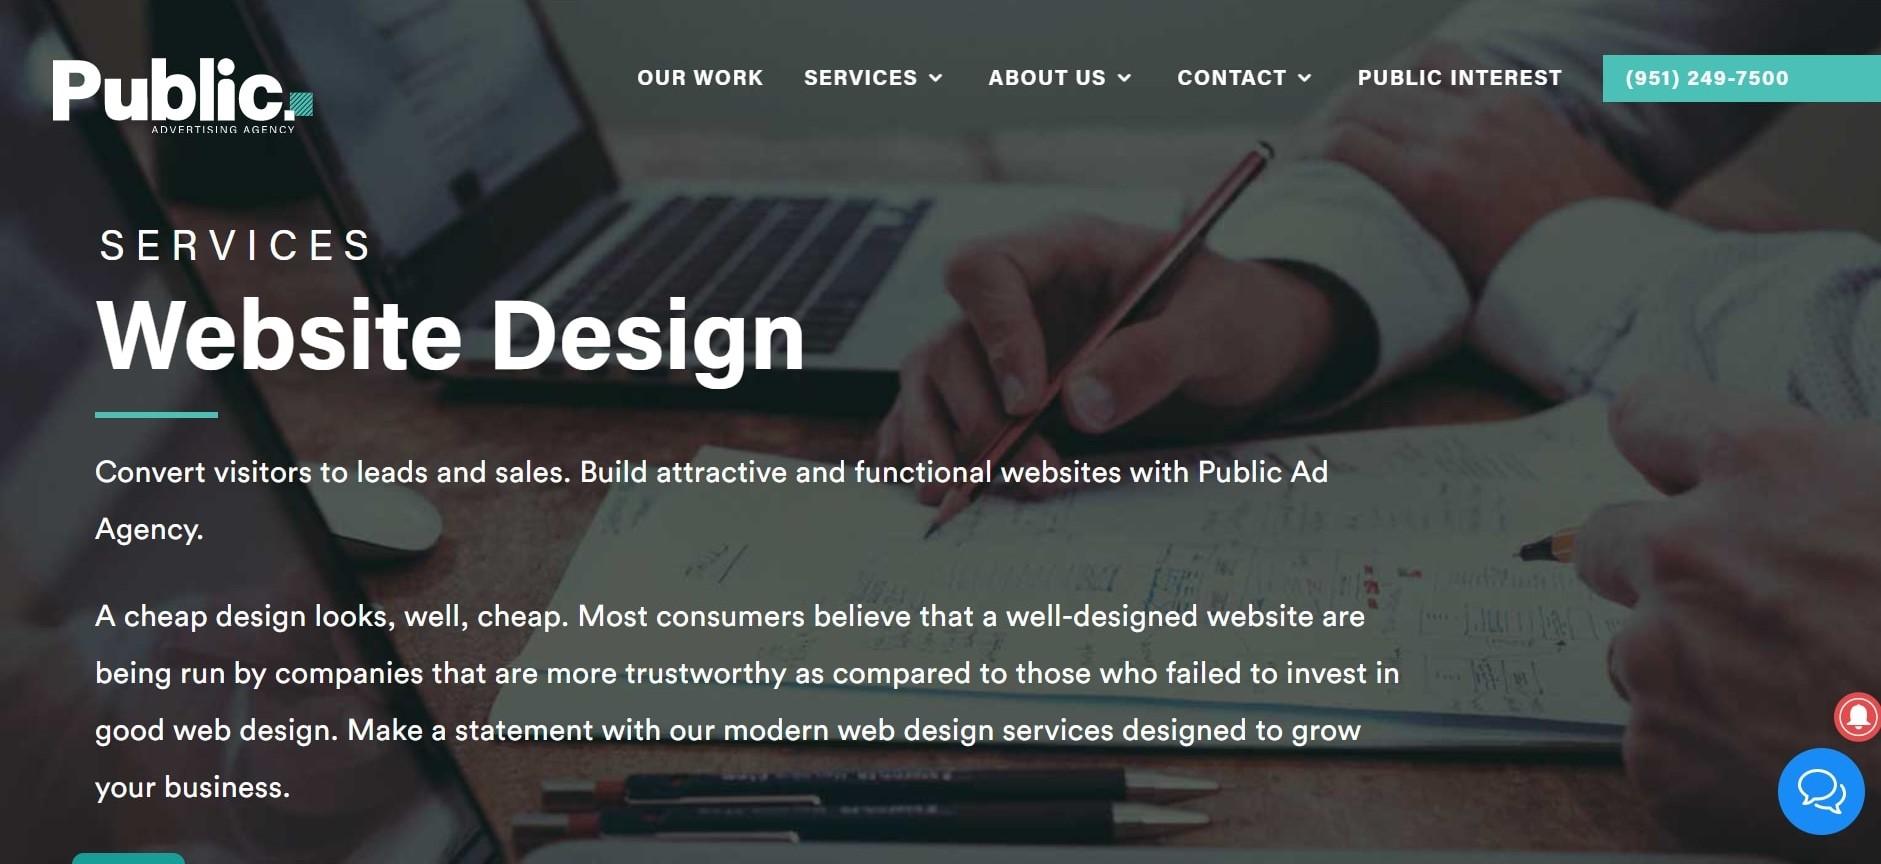 Public Advertising Agency, Inc.